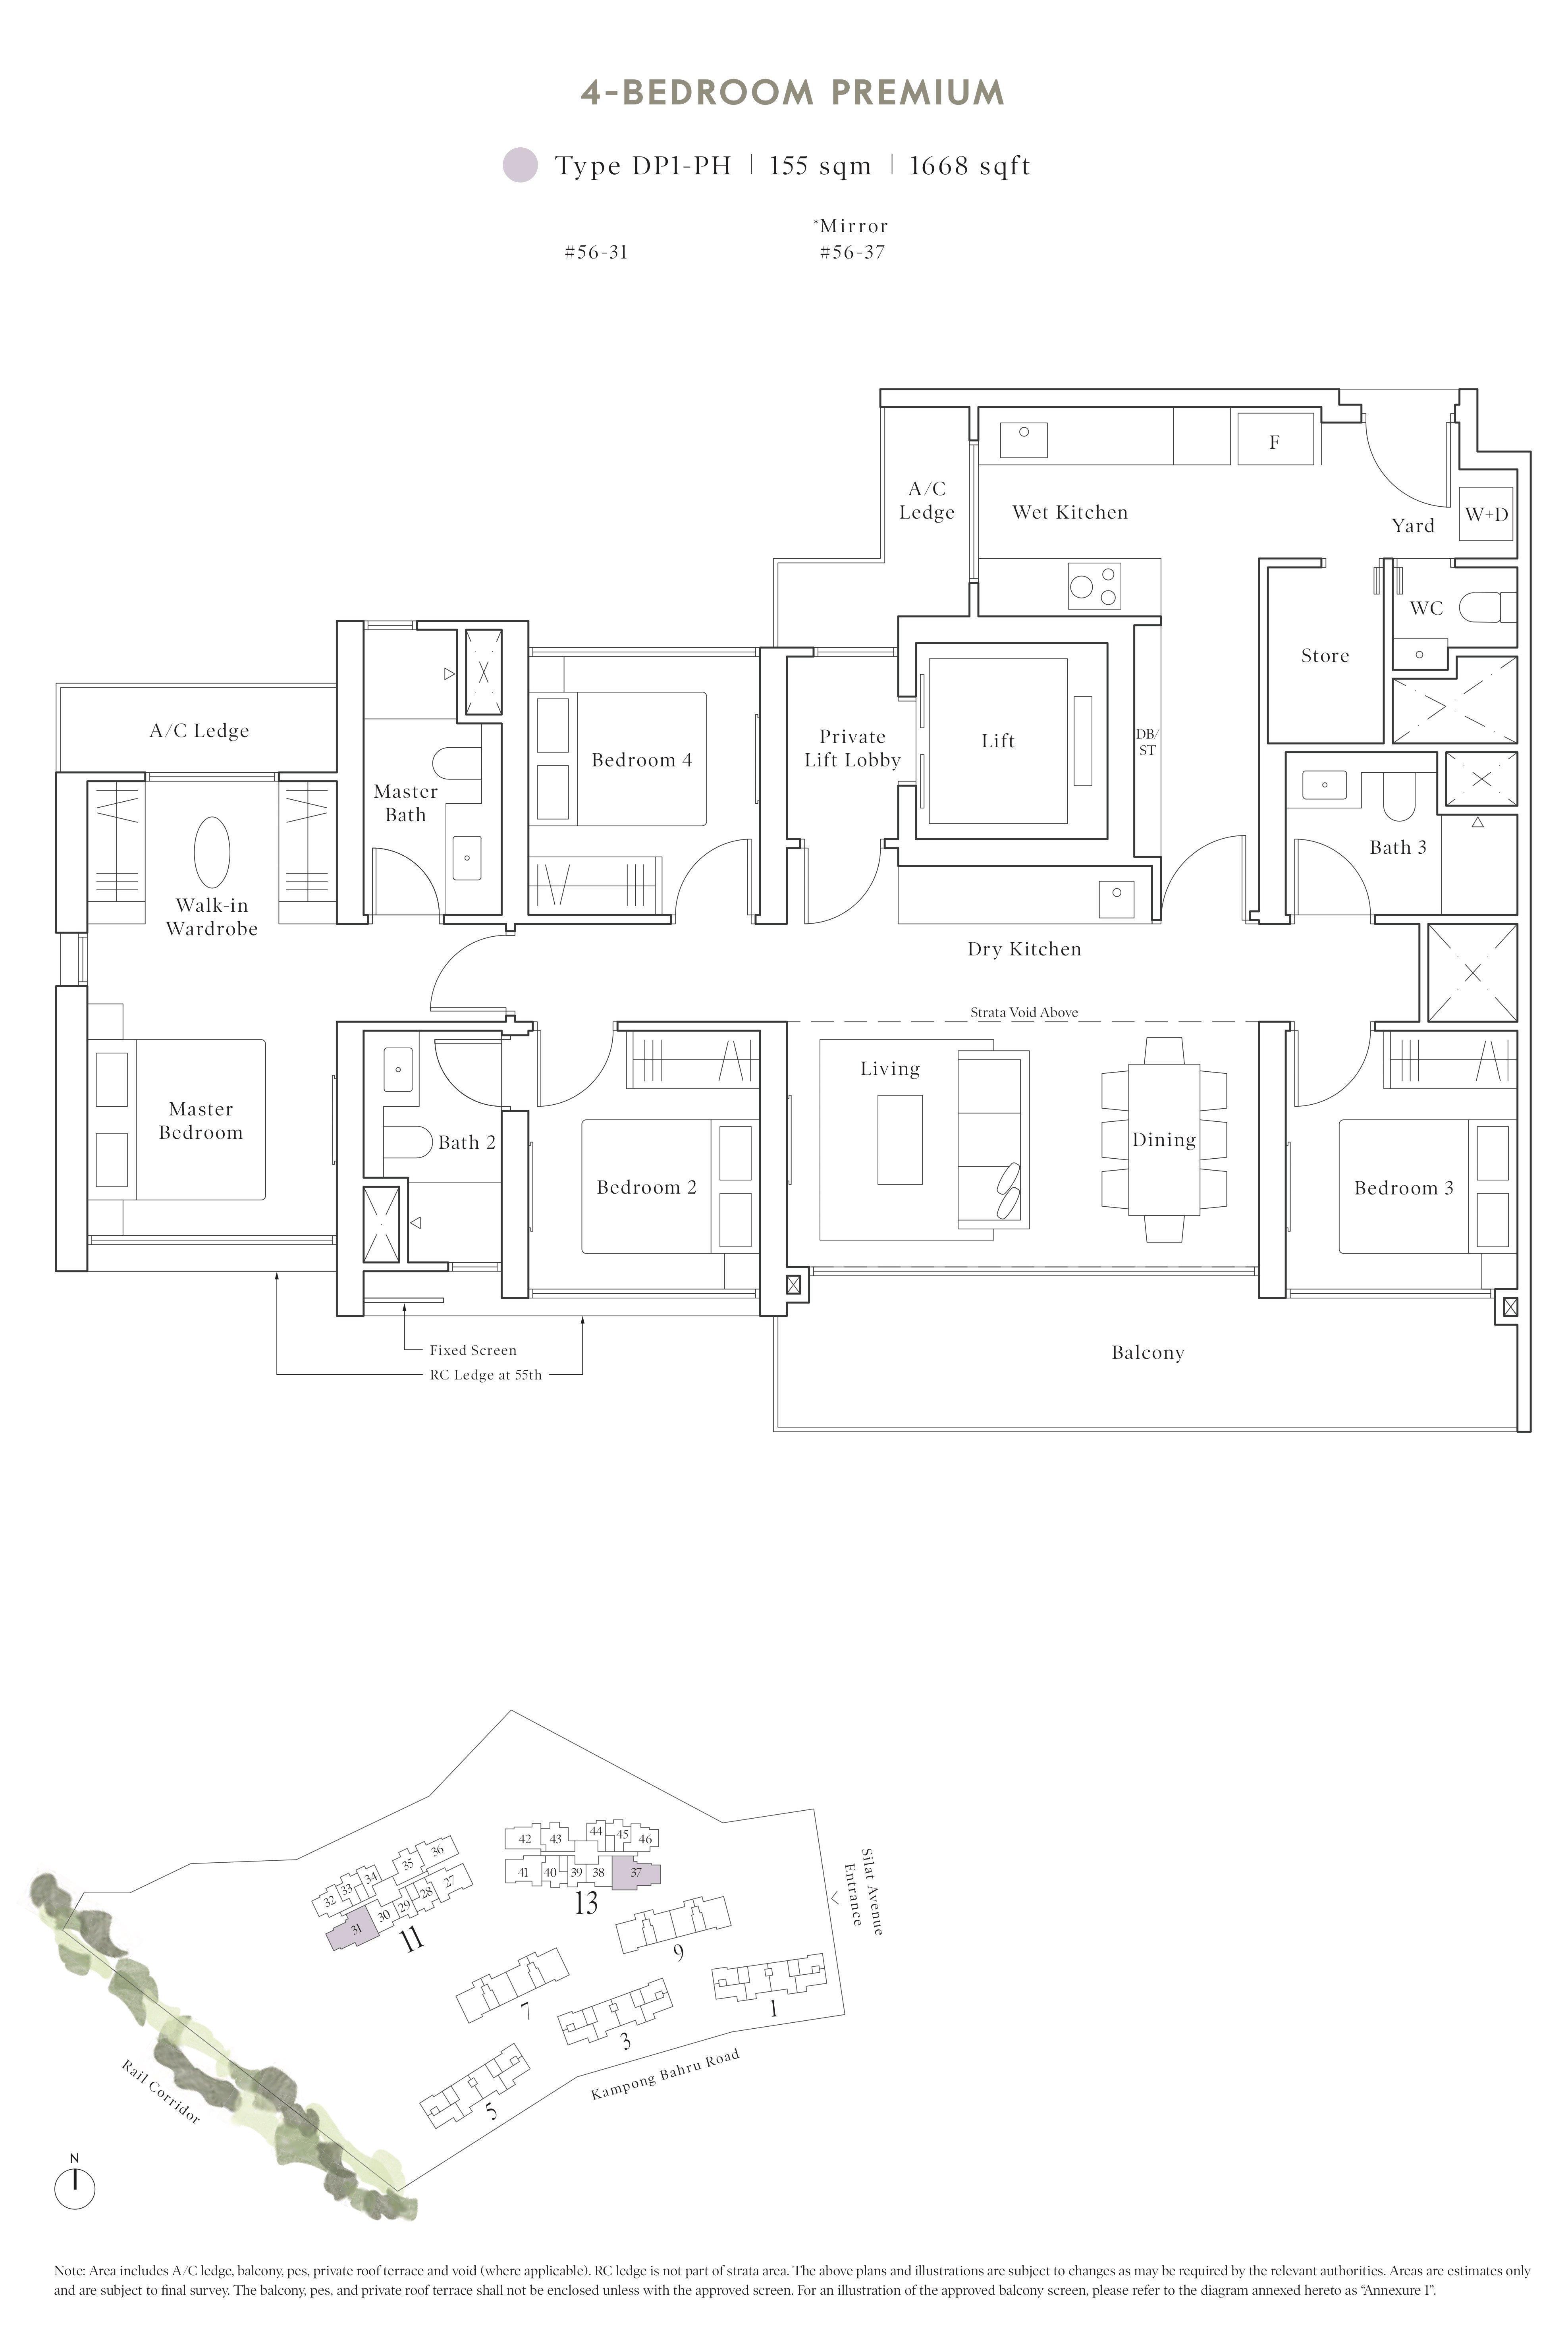 Avenue South Residence 南峰雅苑 peak floor plan 3-bedroom penthouse dp1-ph